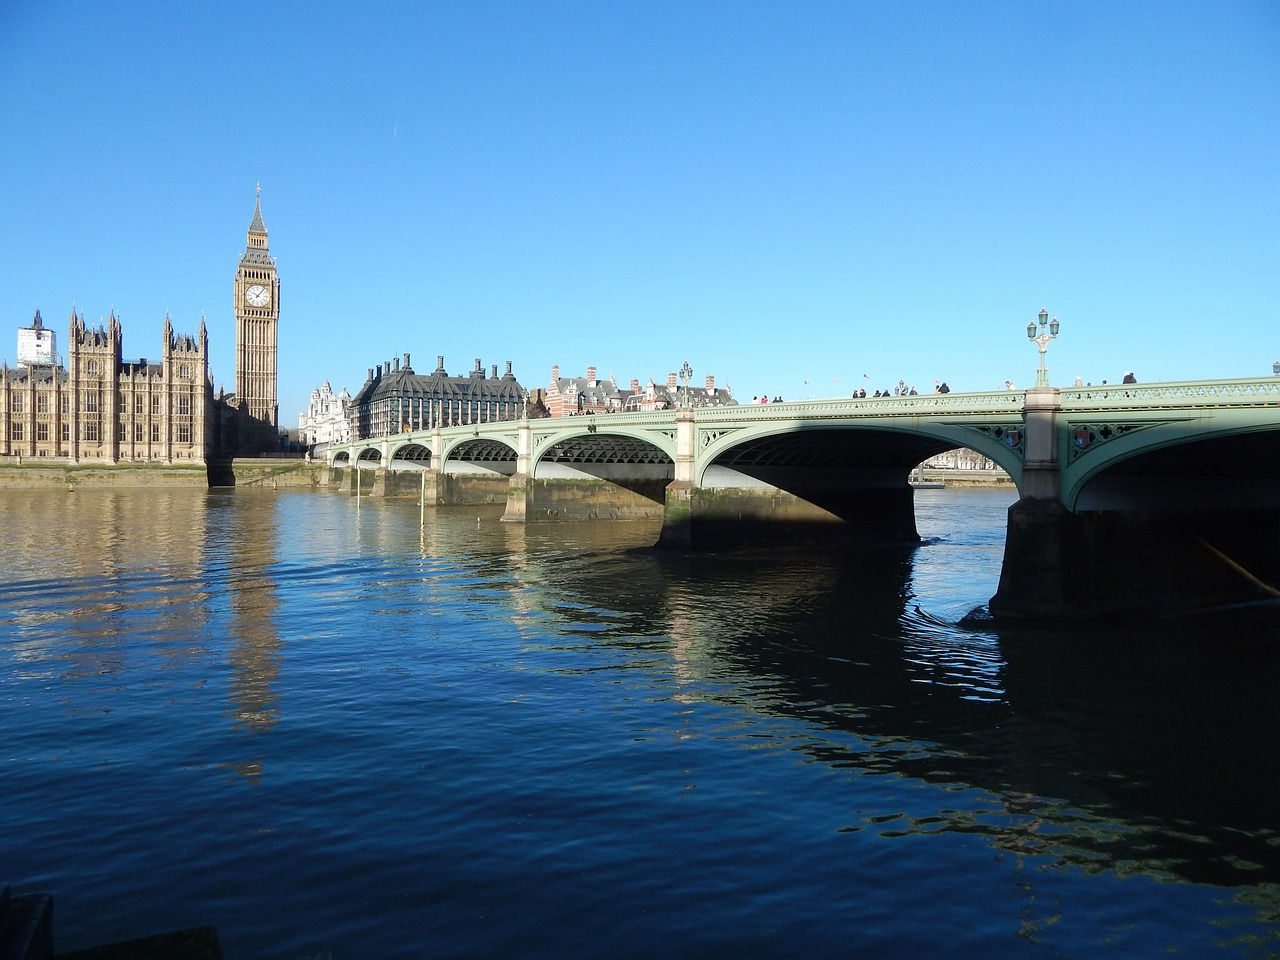 big-ben-638985_1280 London Bridge